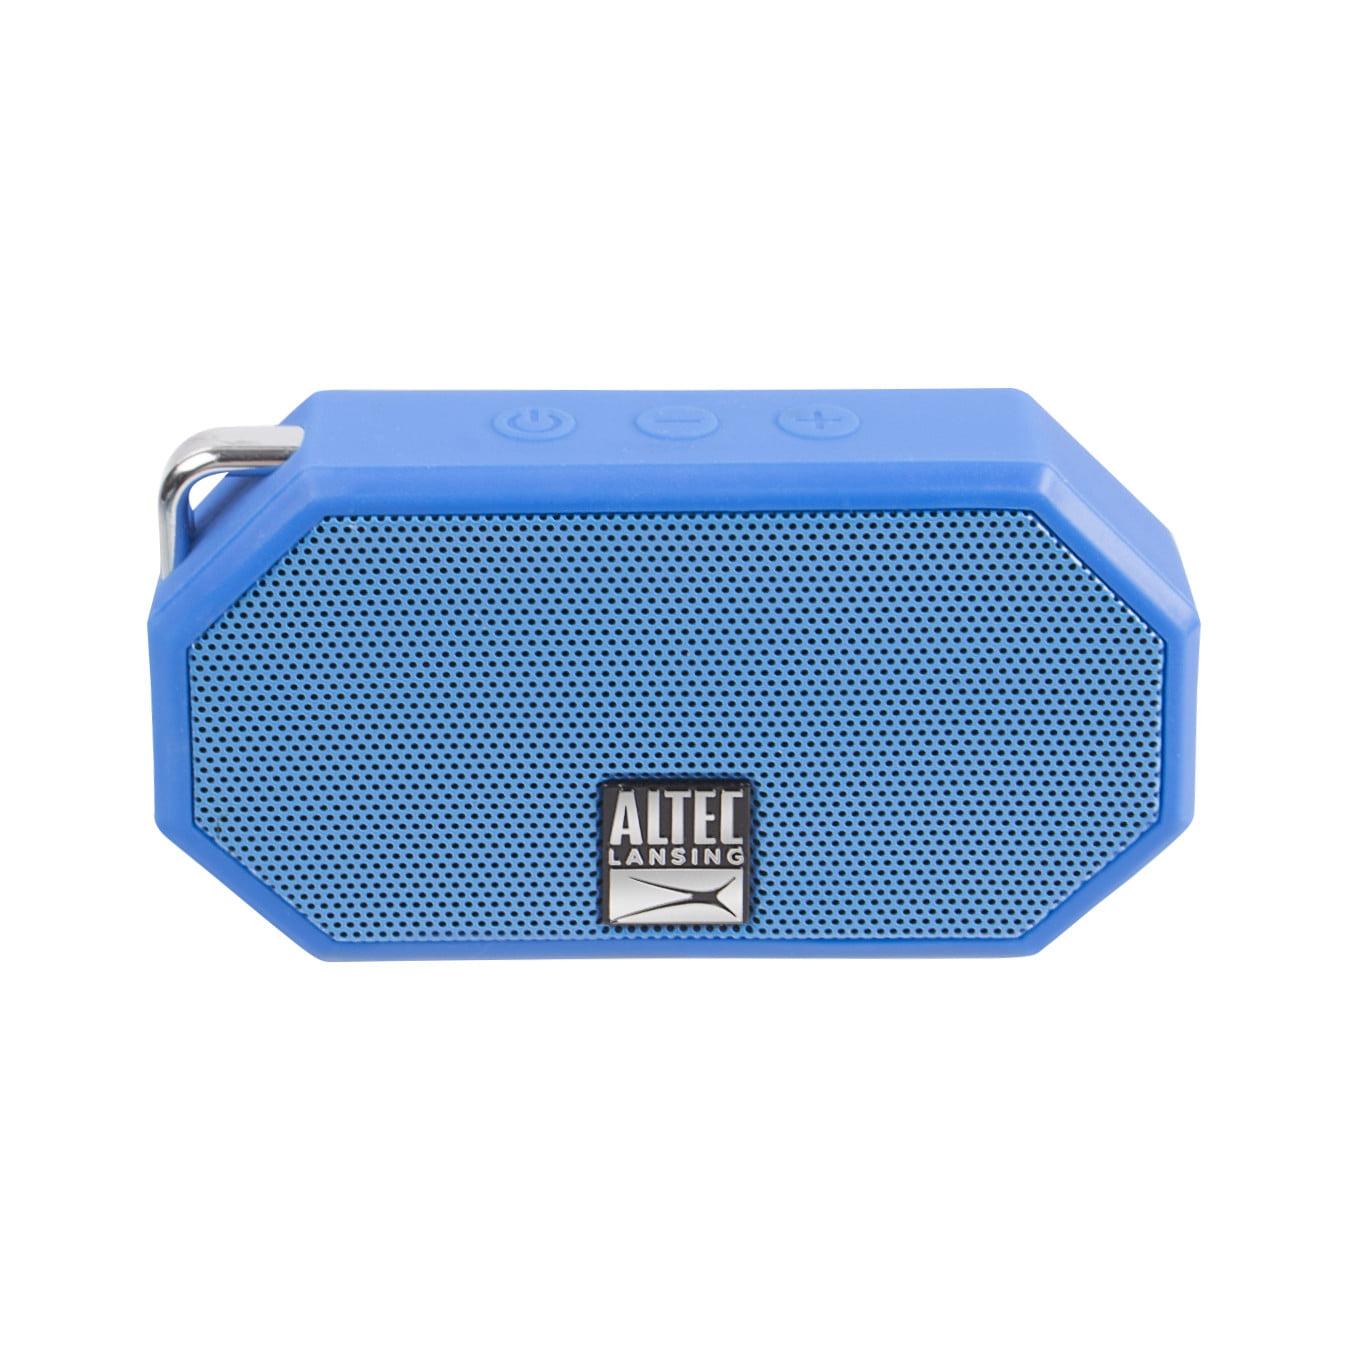 Altec Lansing Mini H20 Bluetooth Speaker Blue